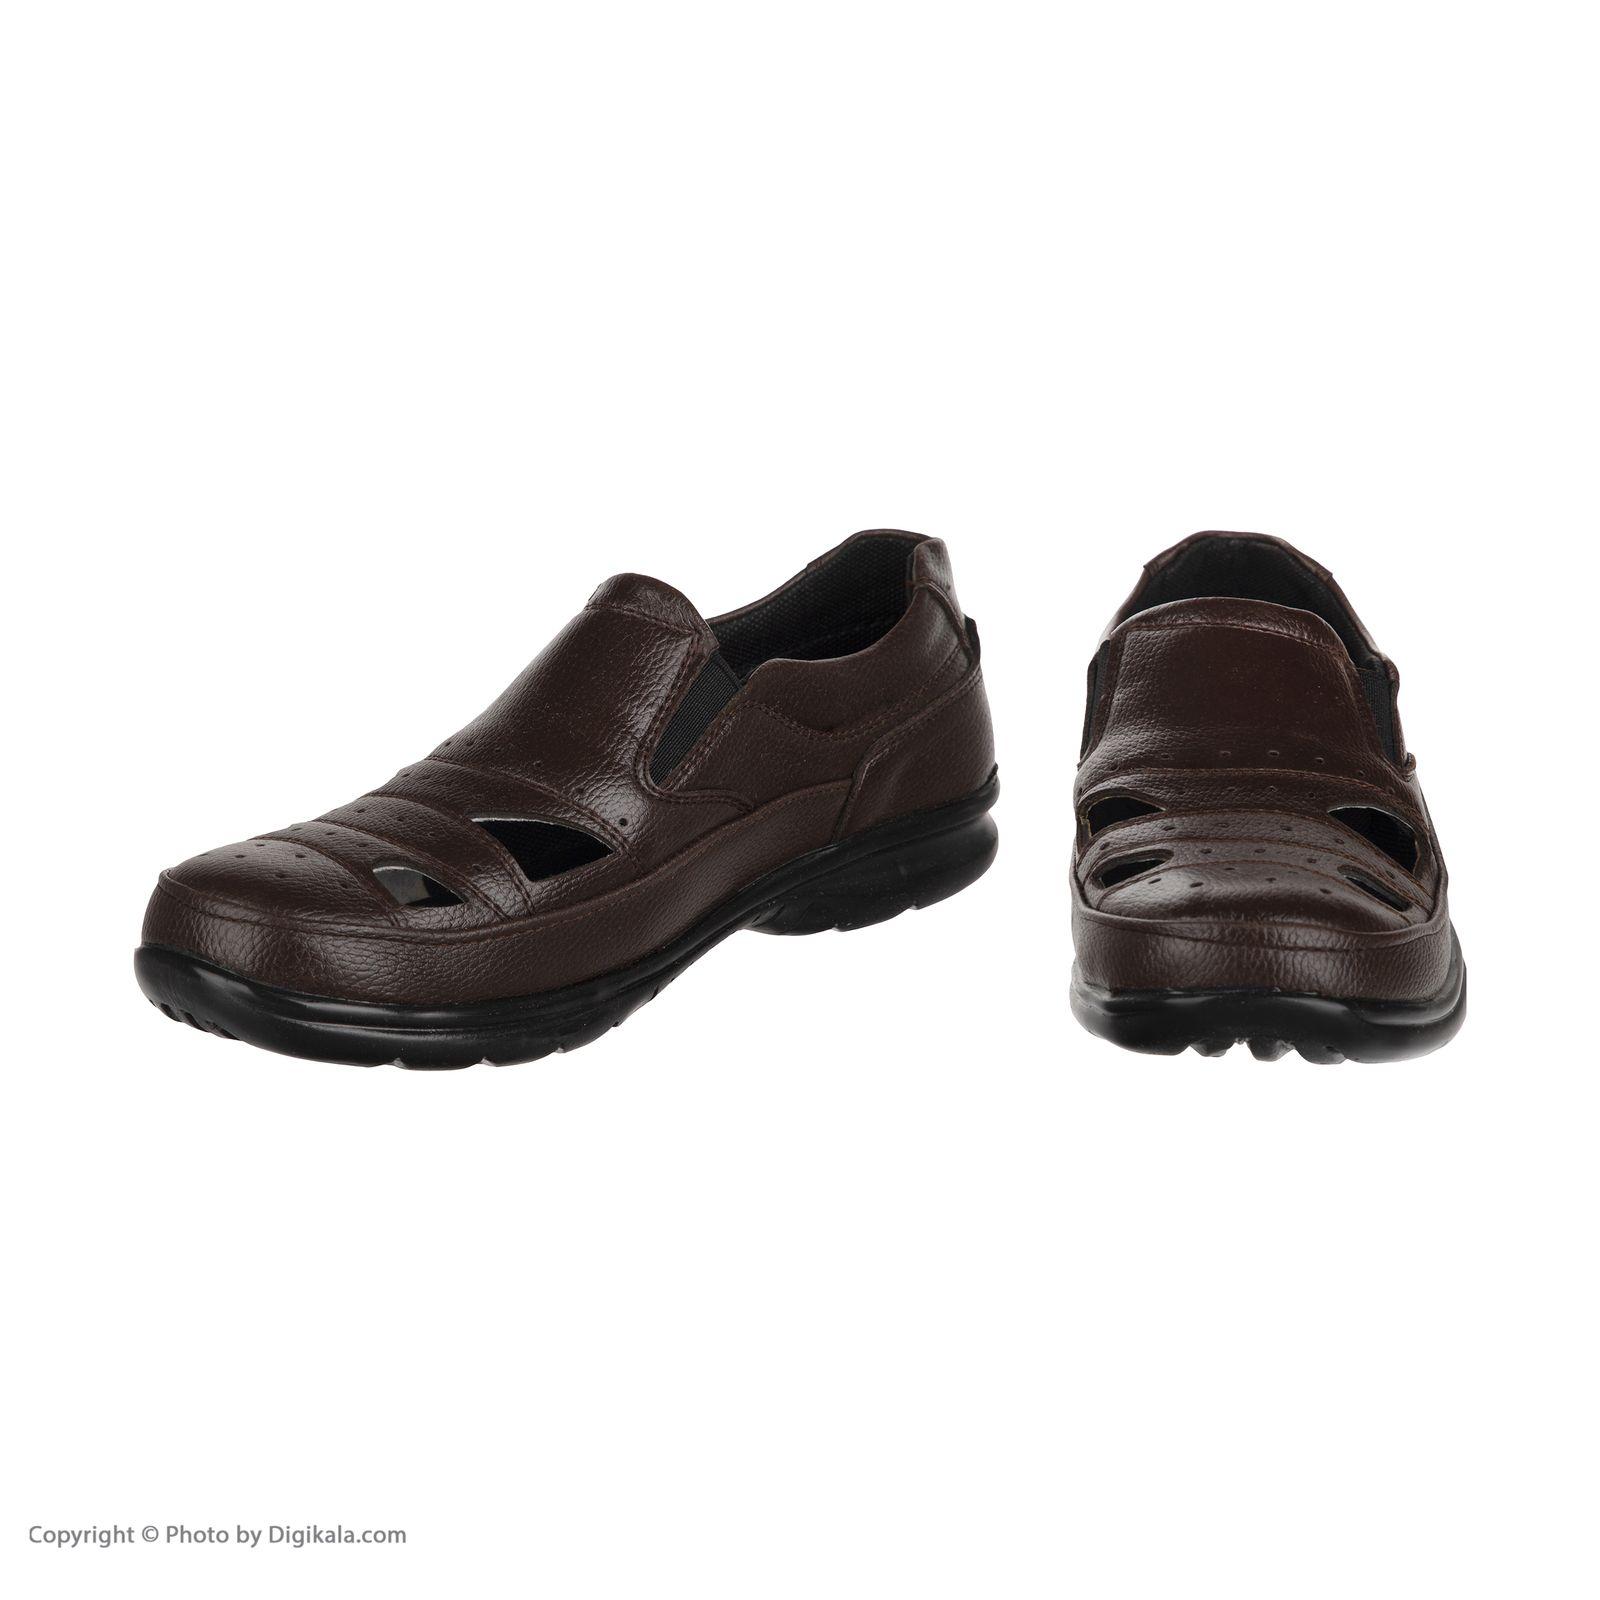 کفش روزمره مردانه مدل k.baz.076 -  - 6